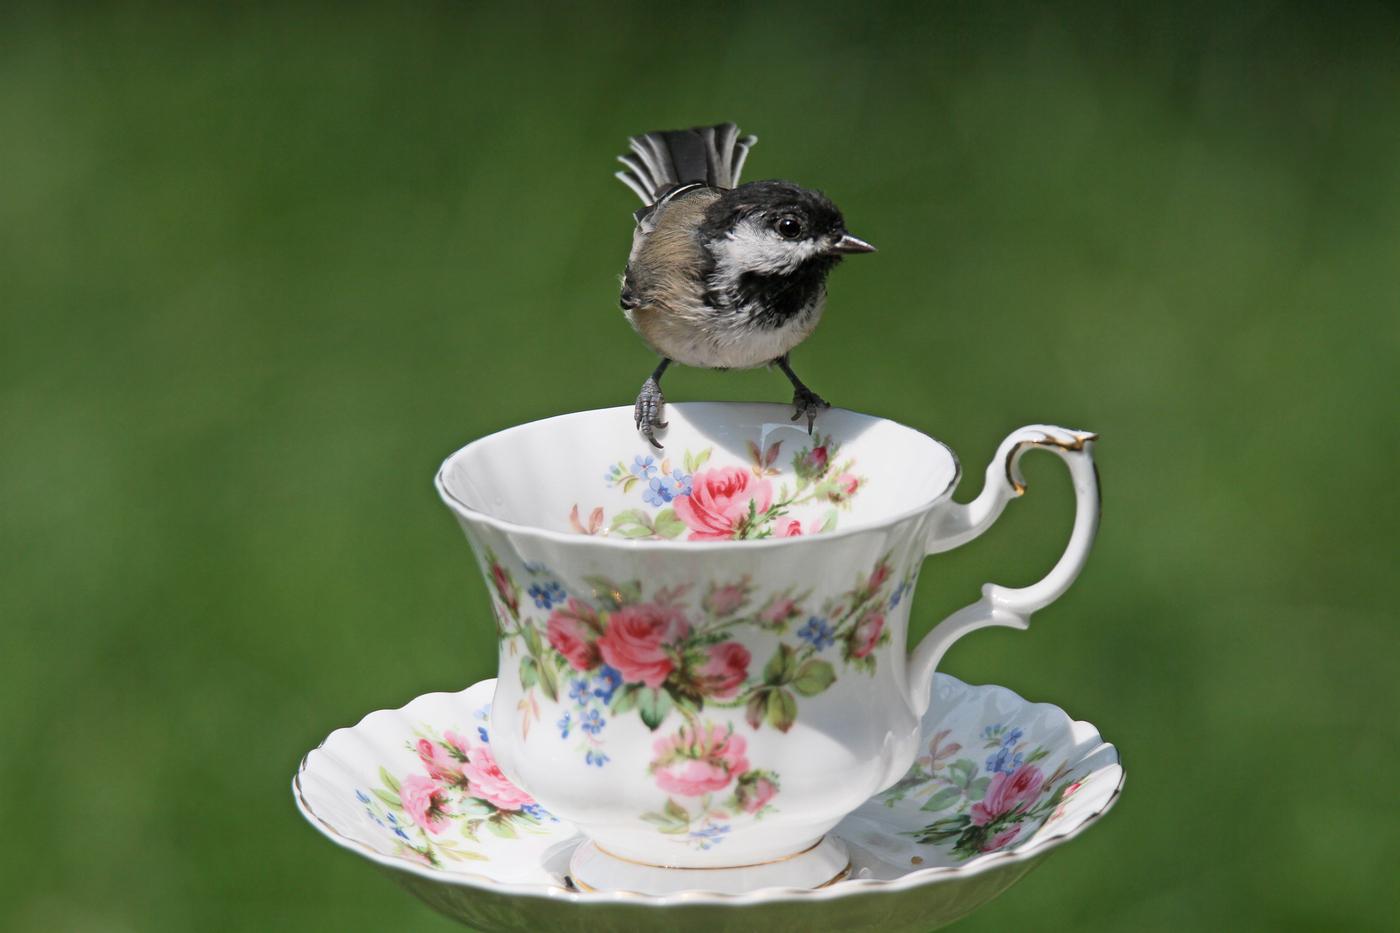 Chickadee at Teacup #26